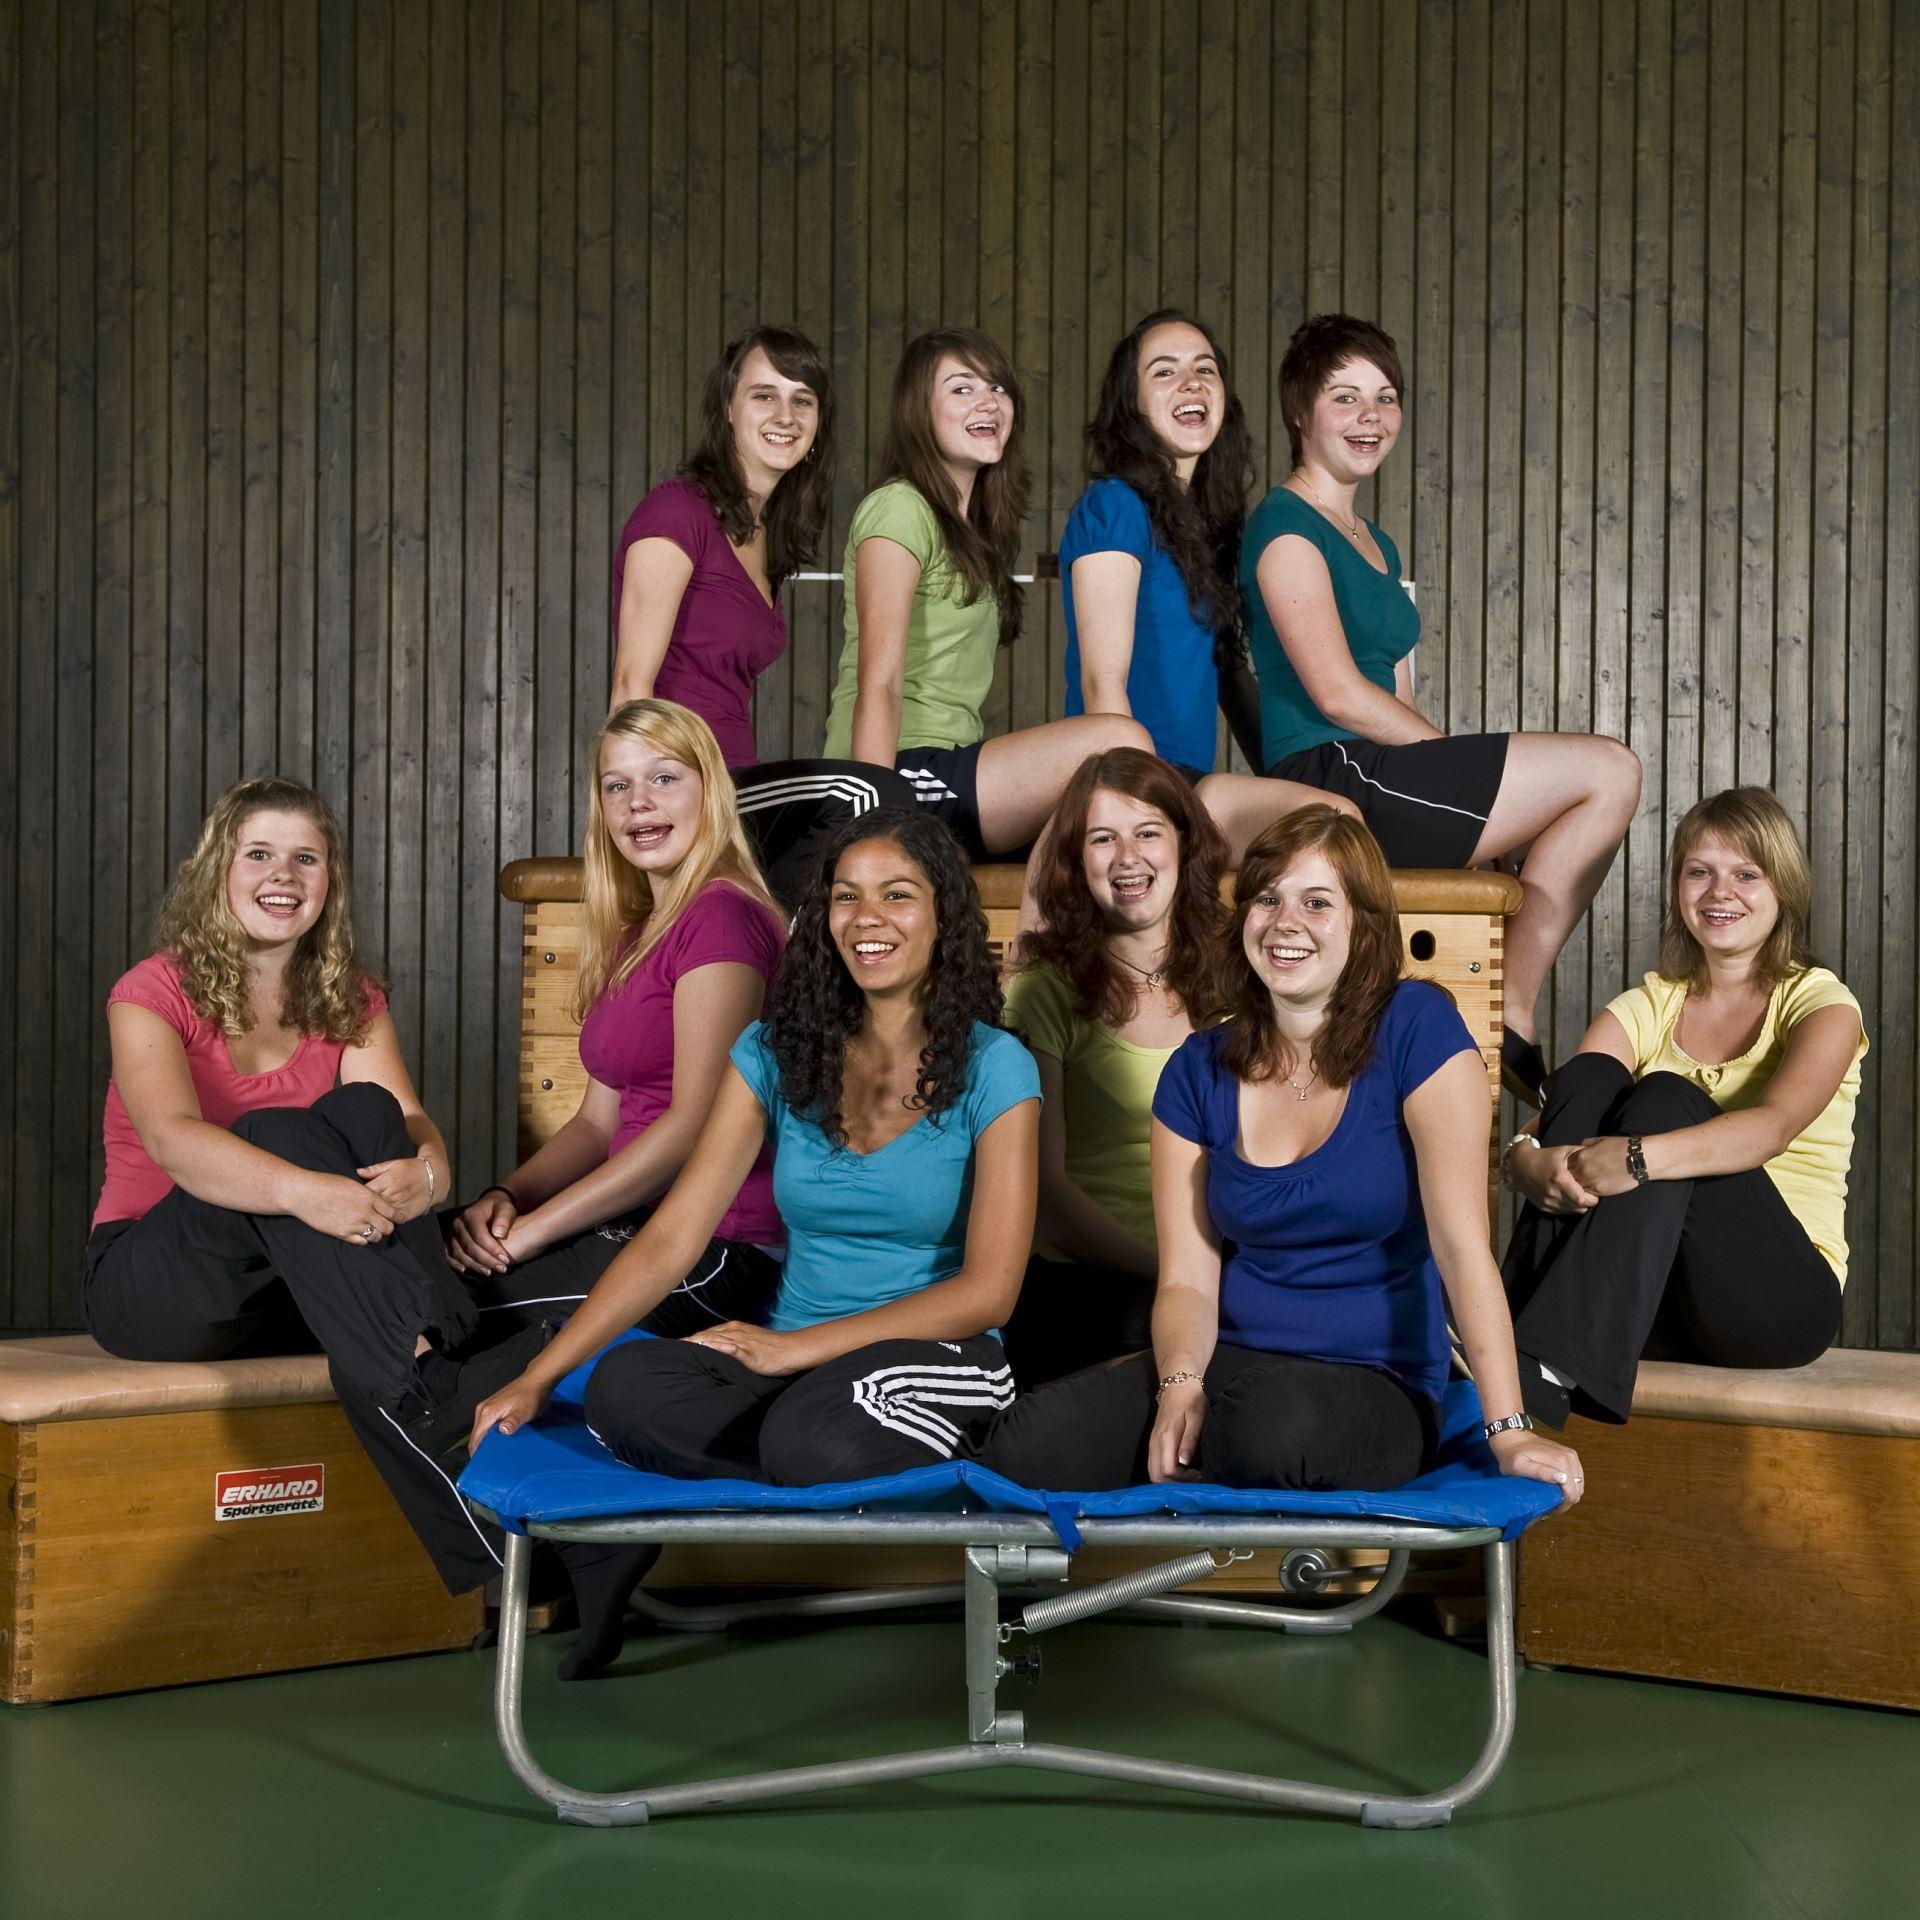 Jugendturnen (Gruppe 1) im Jahr 2010 (05)